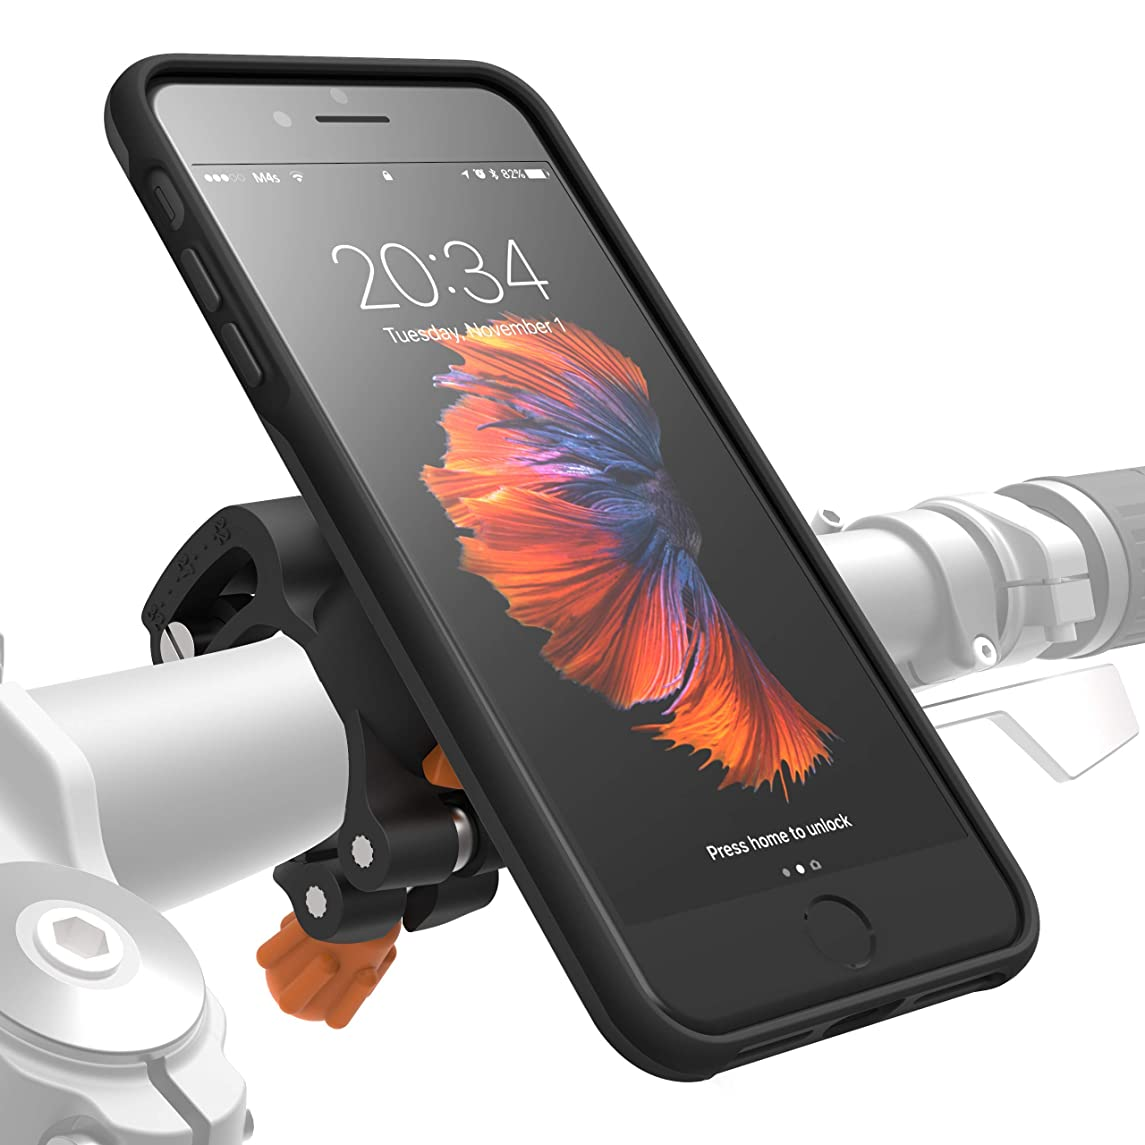 MORPHEUS LABS M4s iPhone 8 Plus Bike Mount, Phone Holder & iPhone 8 Plus Case, Bicycle Holder, fits Most Handlebars, 360 Rotation, Stand, Bike Kit for iPhone 8 Plus / 7 Plus / 7Plus / 8Plus [Black]